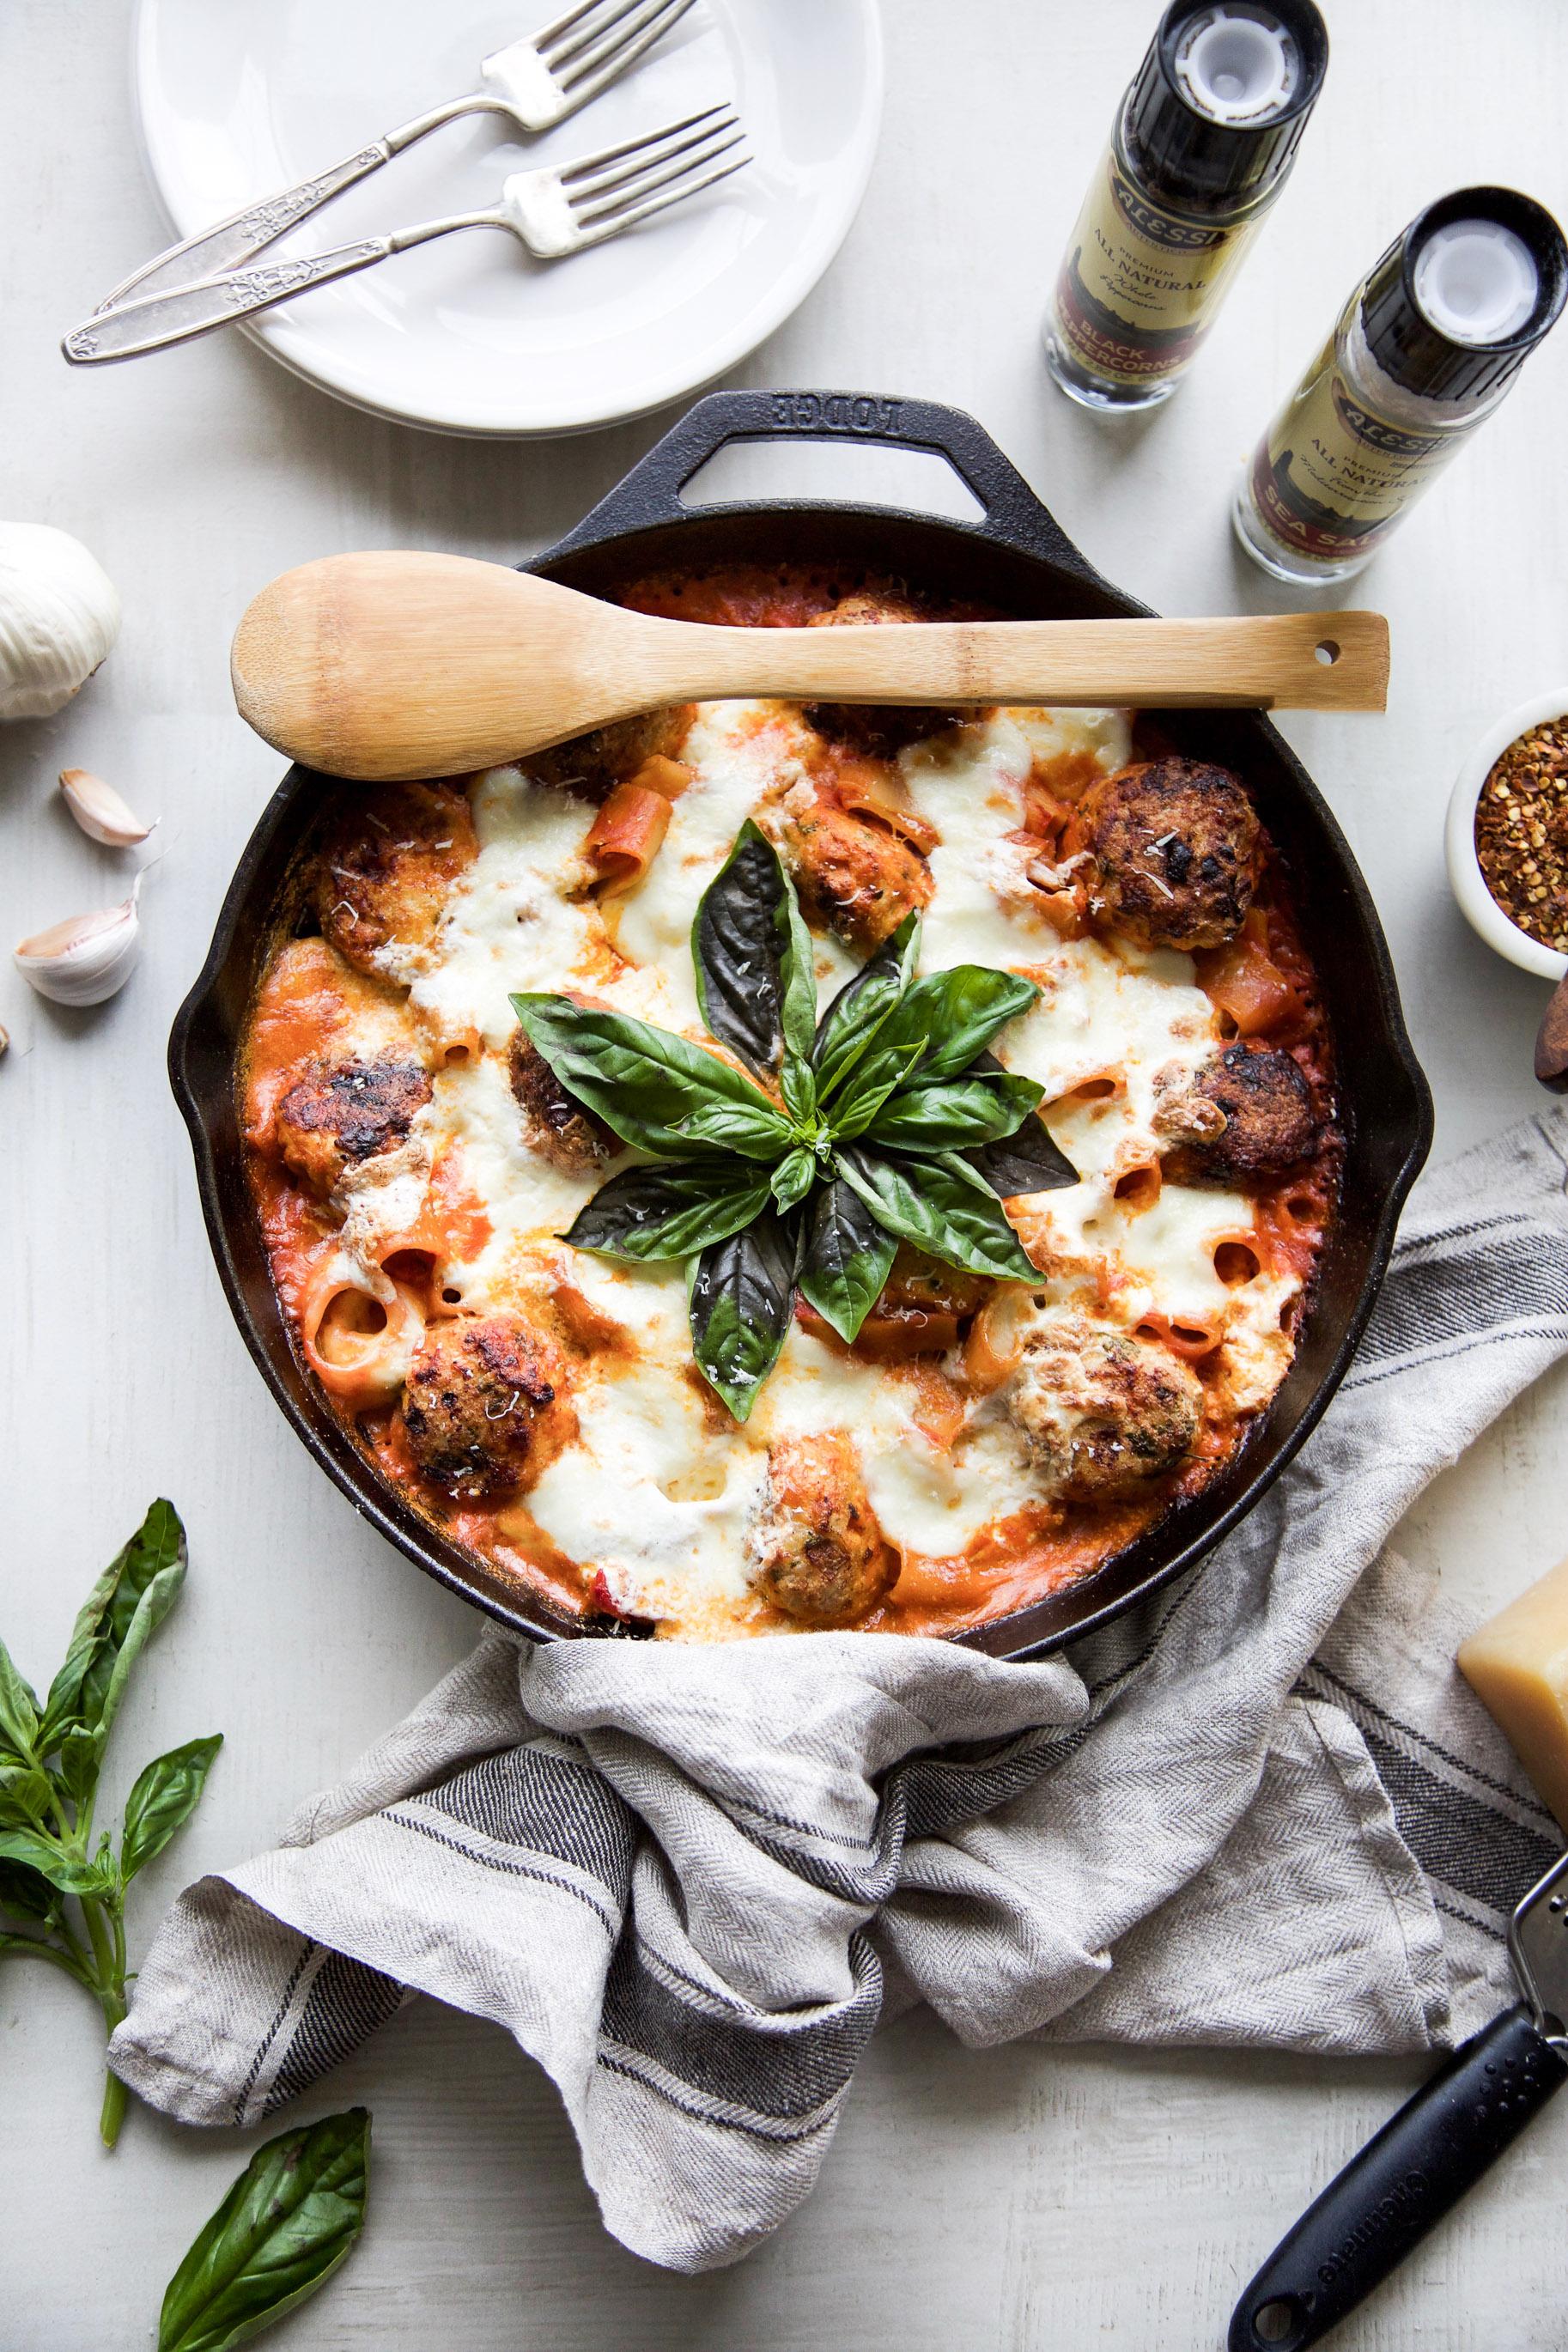 One-Pan-Chicken-Parm-Meatball-Burrata-Pasta-Bake4.jpg